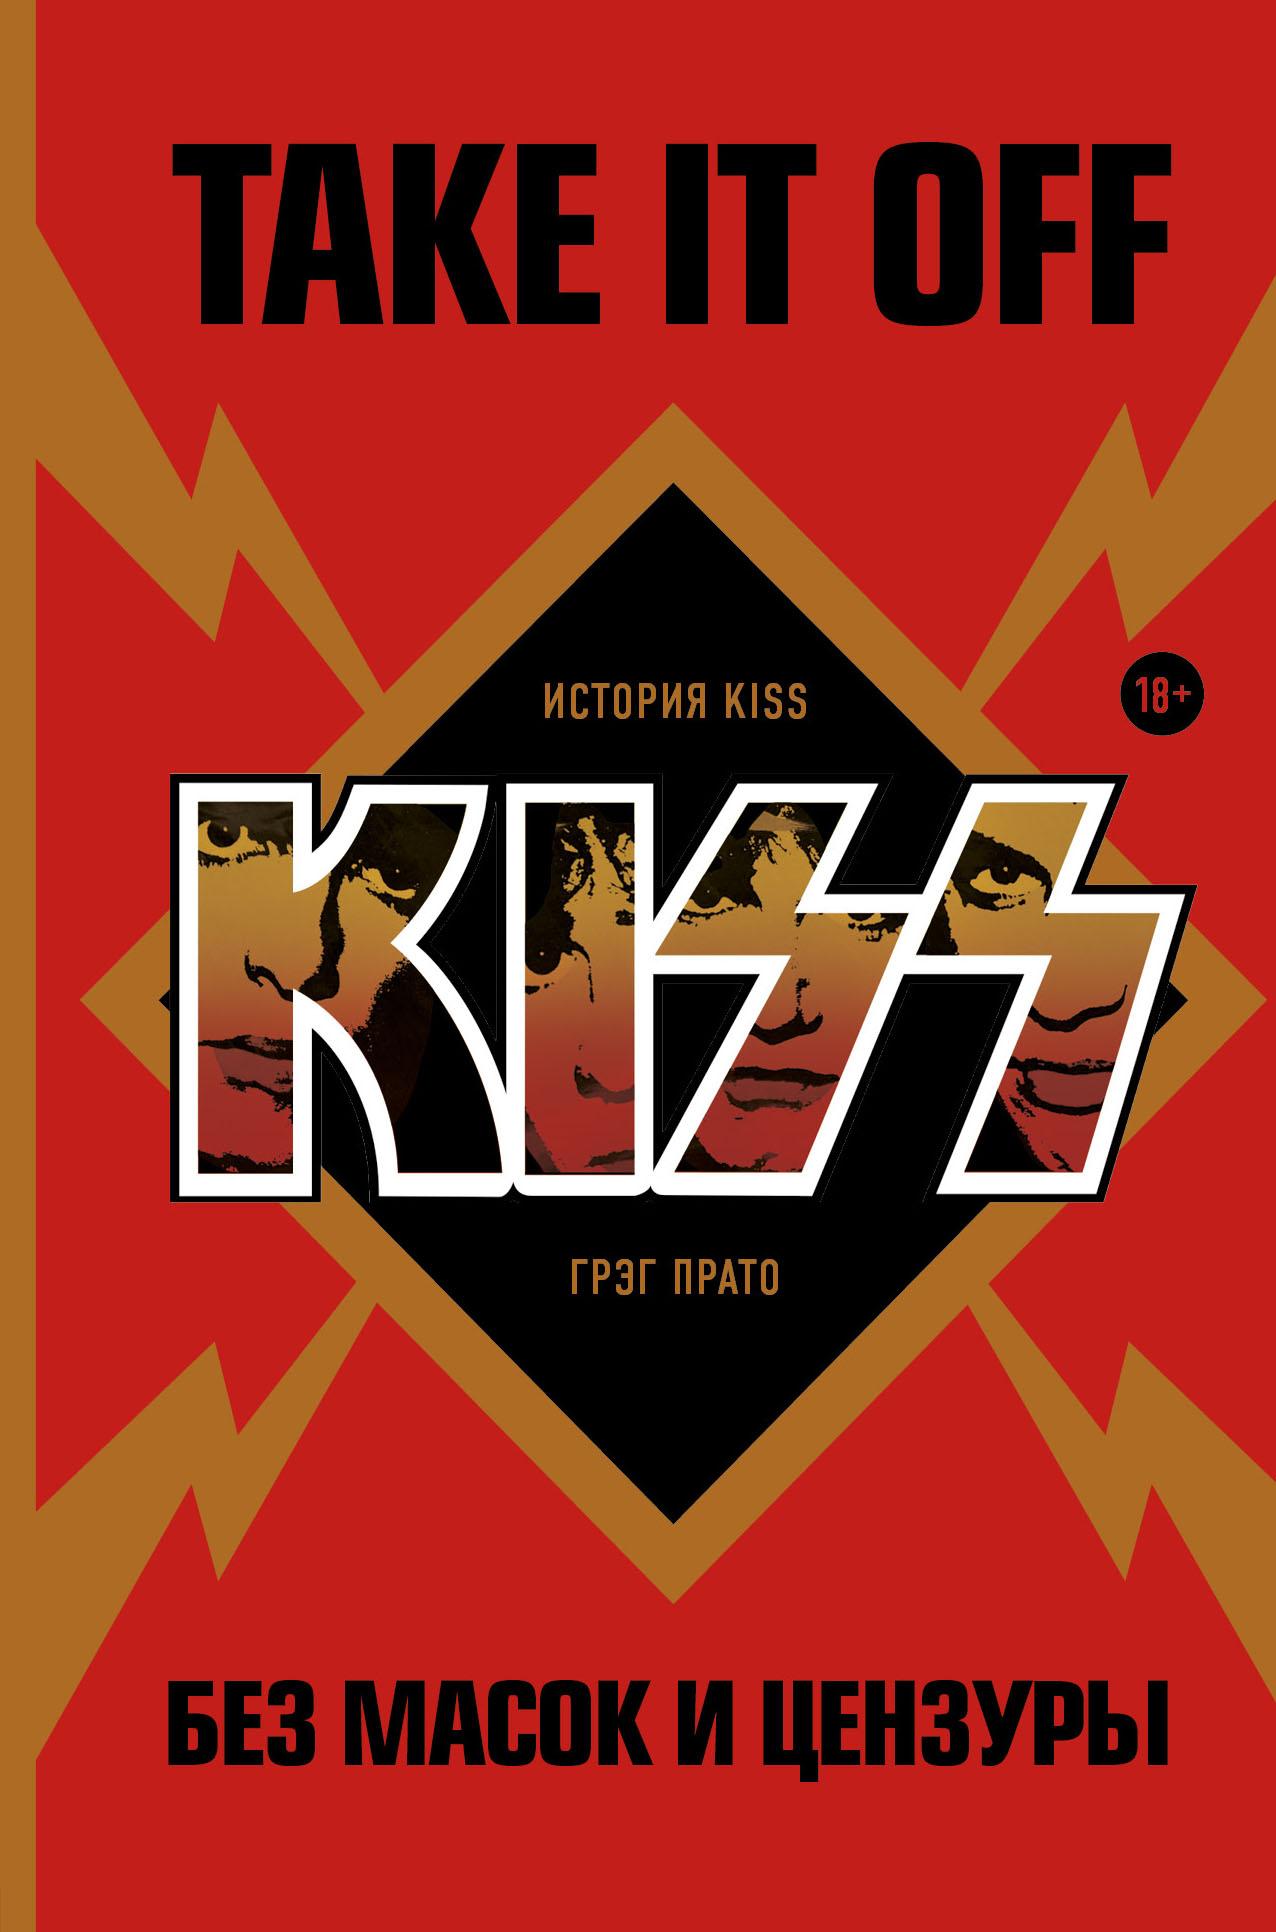 Купить книгу Take It Off: история Kiss без масок и цензуры, автора Грега Прато